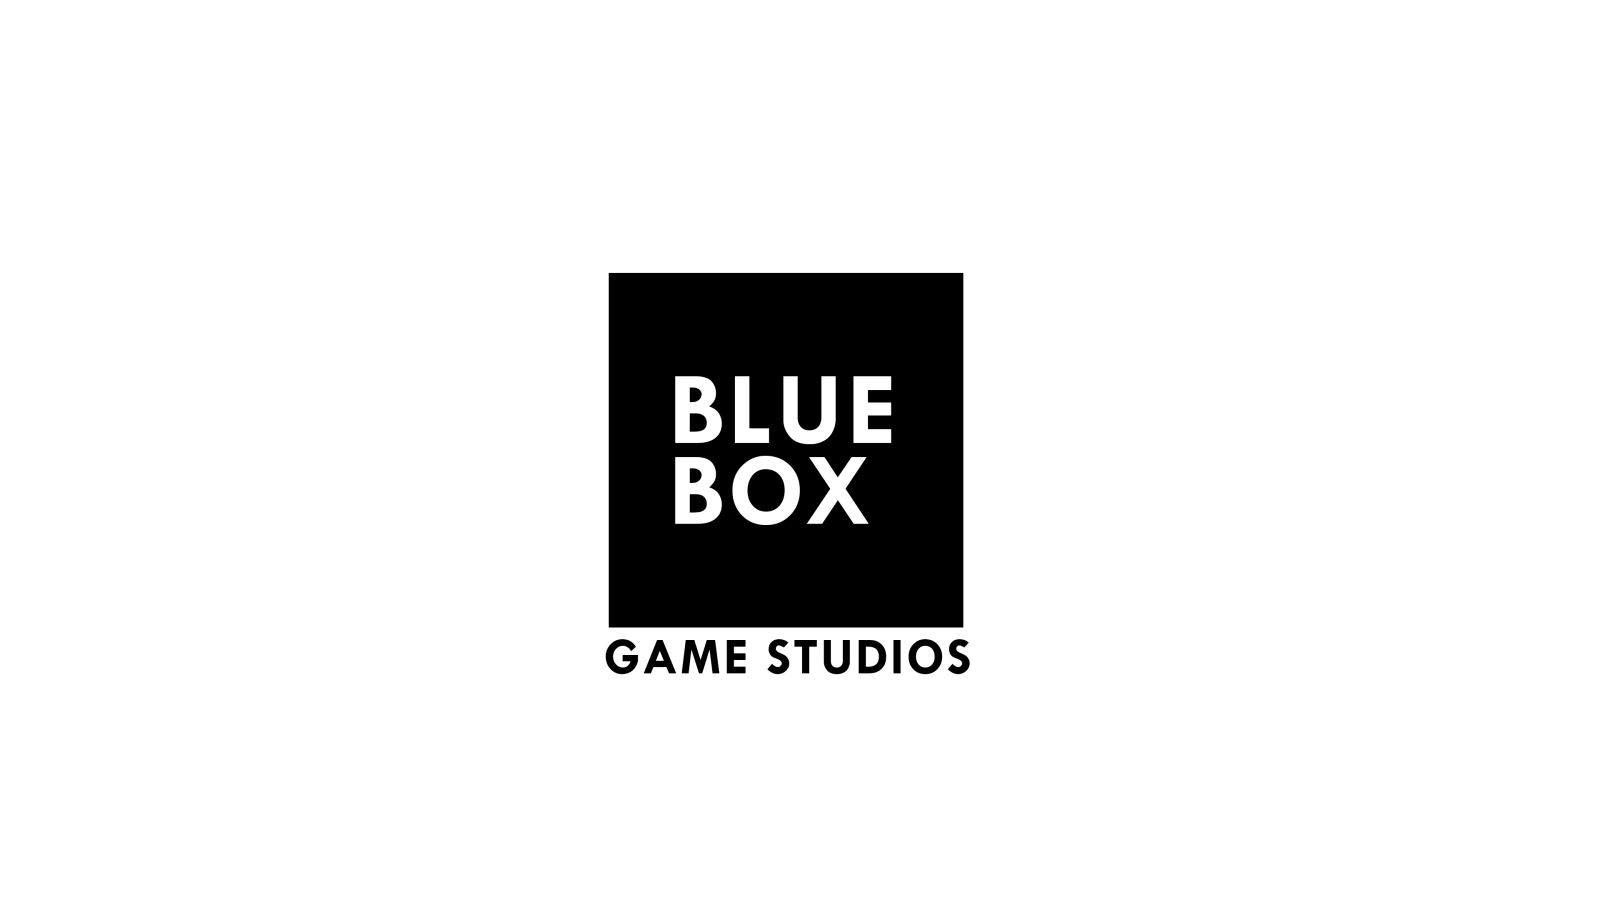 Blue Box 工作室:我们真和《寂静岭》或小岛秀夫没关系